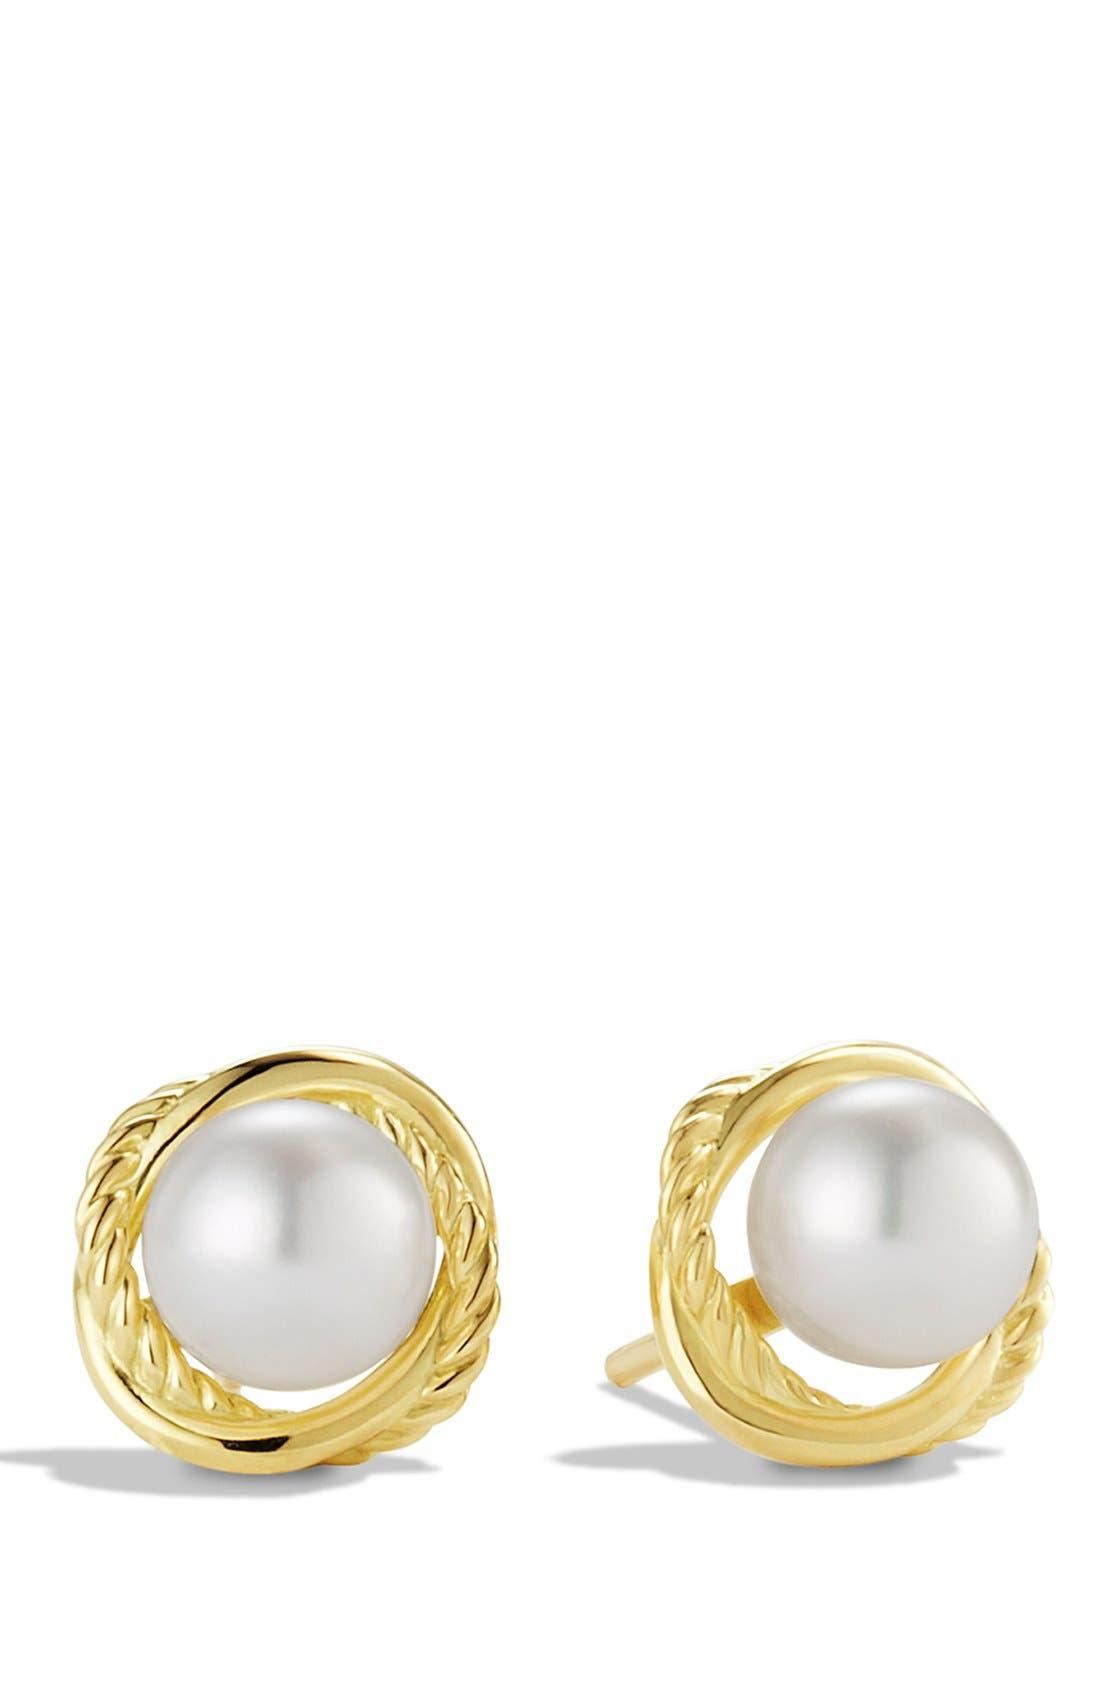 Main Image - David Yurman 'Infinity' Earrings with Pearls in Gold